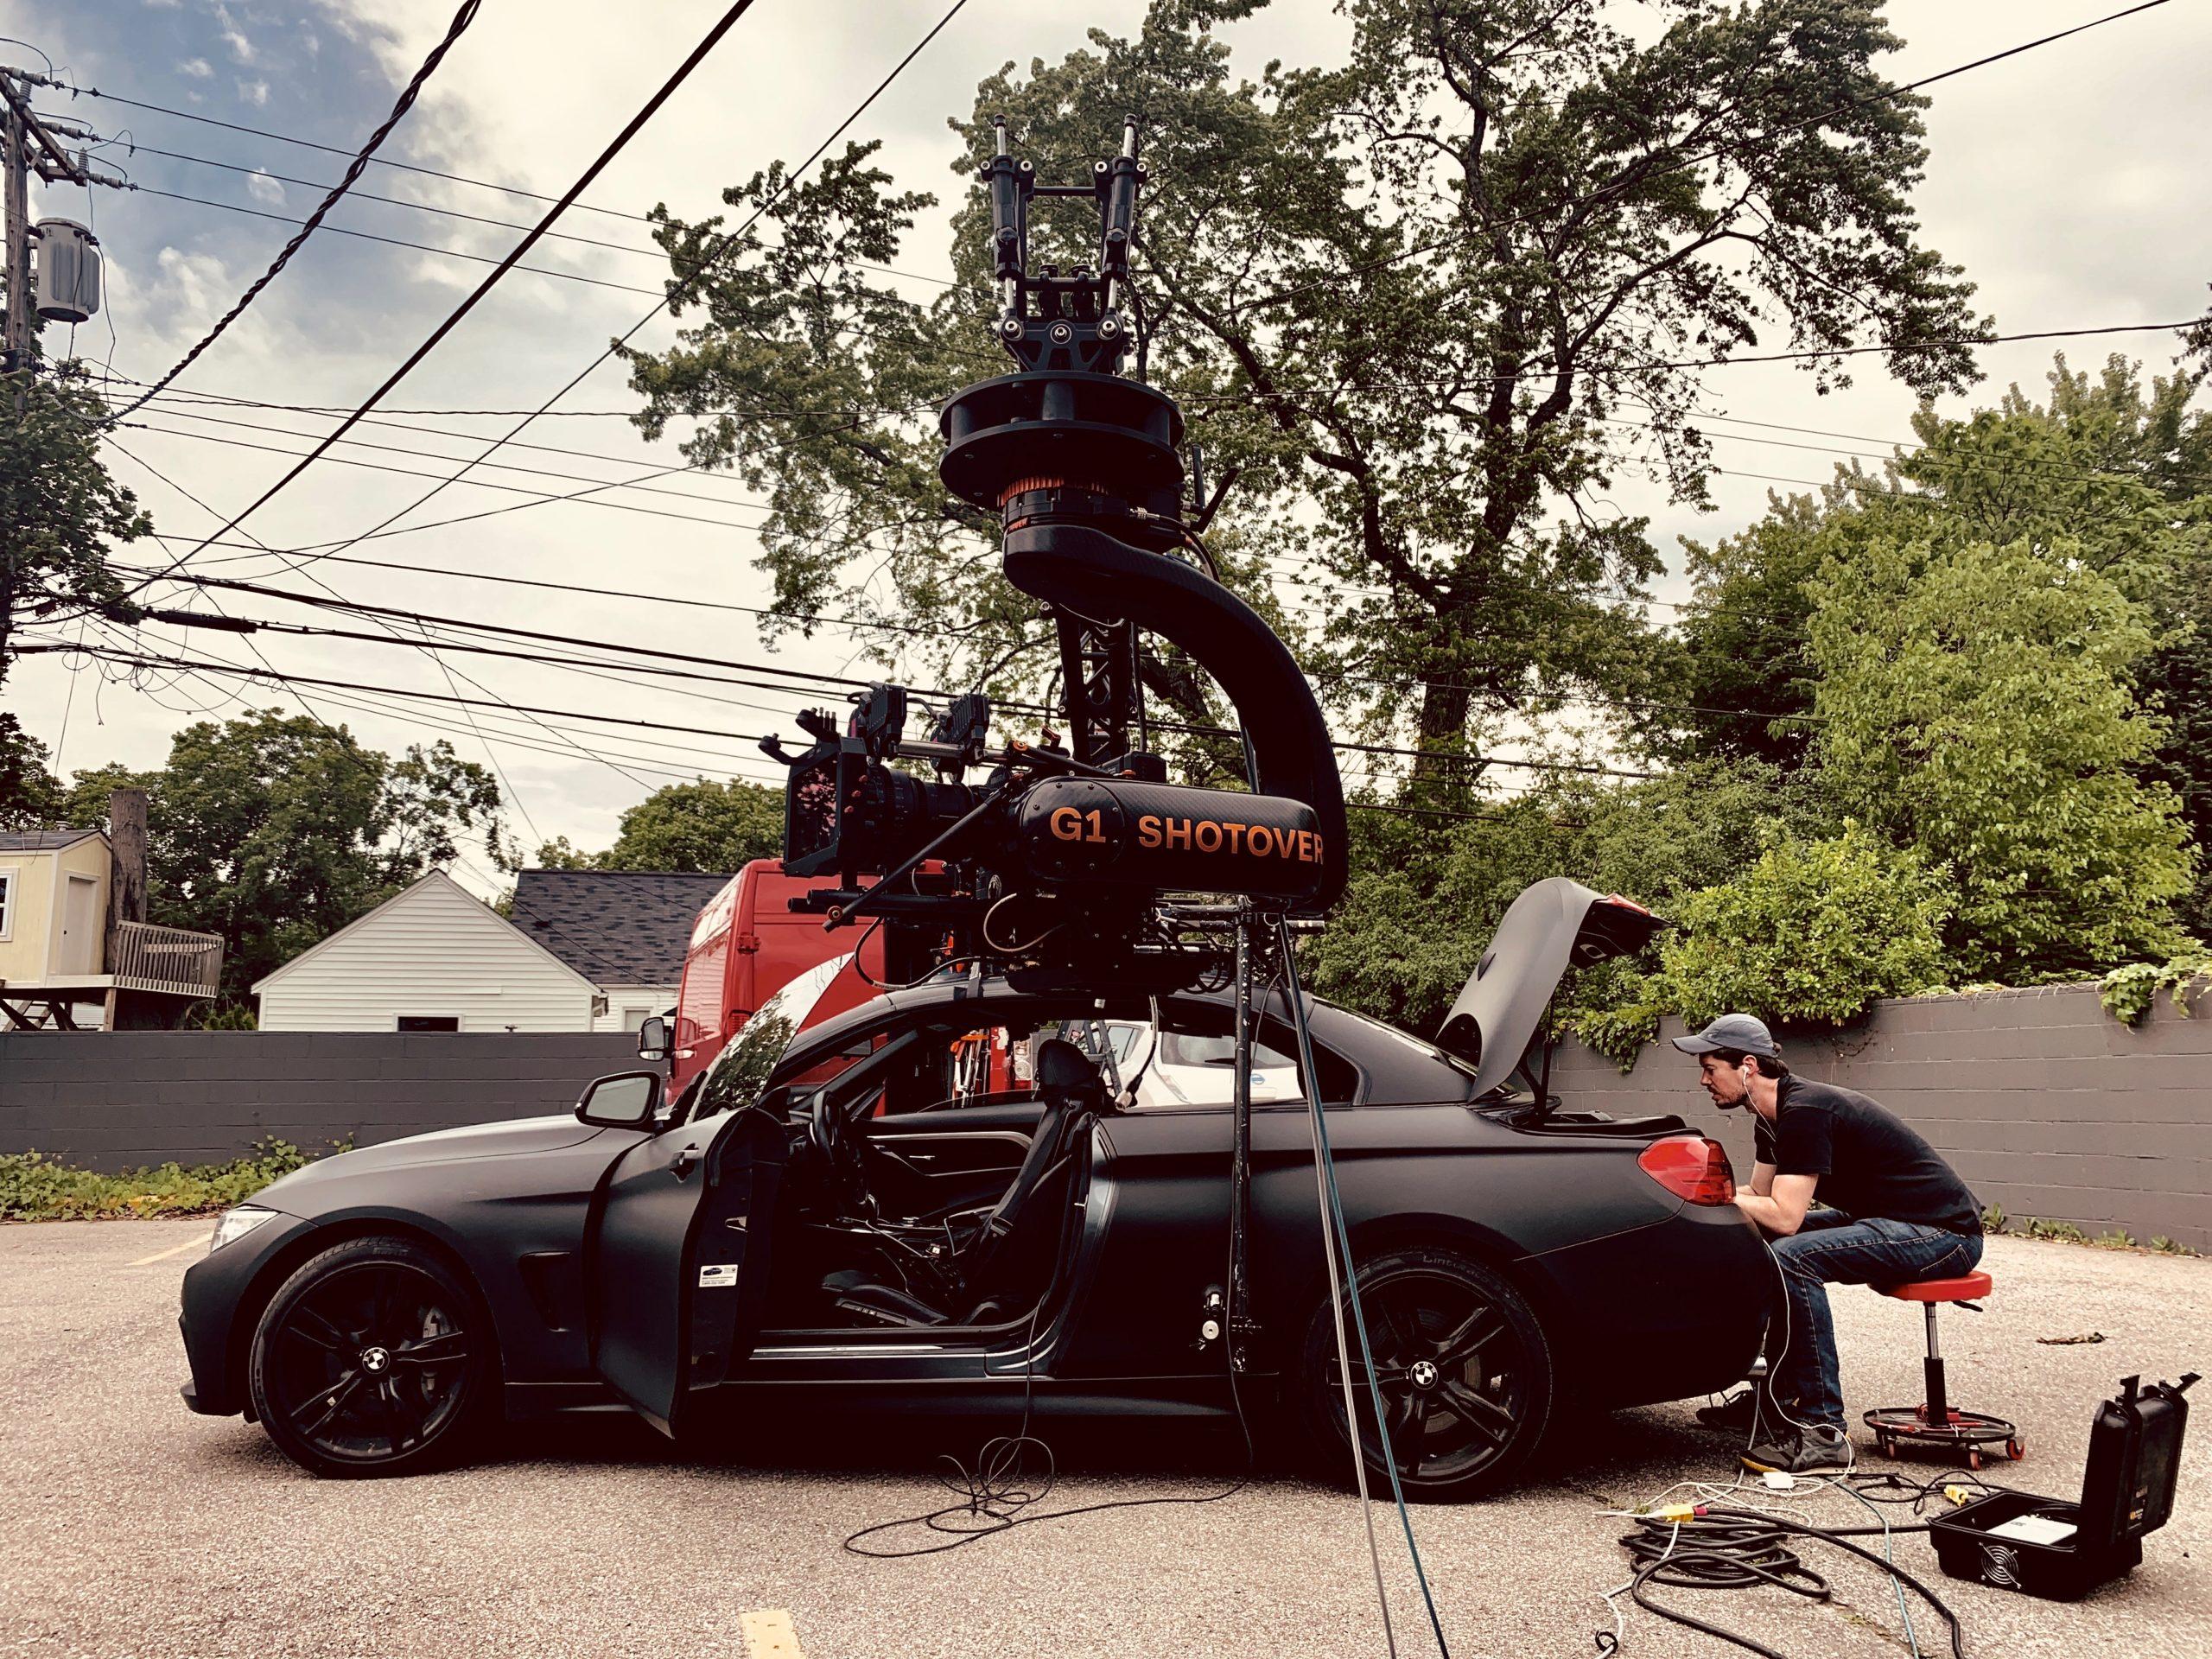 G1 Shotover, camera / light & grip rental, red, monstro, vv, 8k, camera rental, detroit based production company, film camera rental